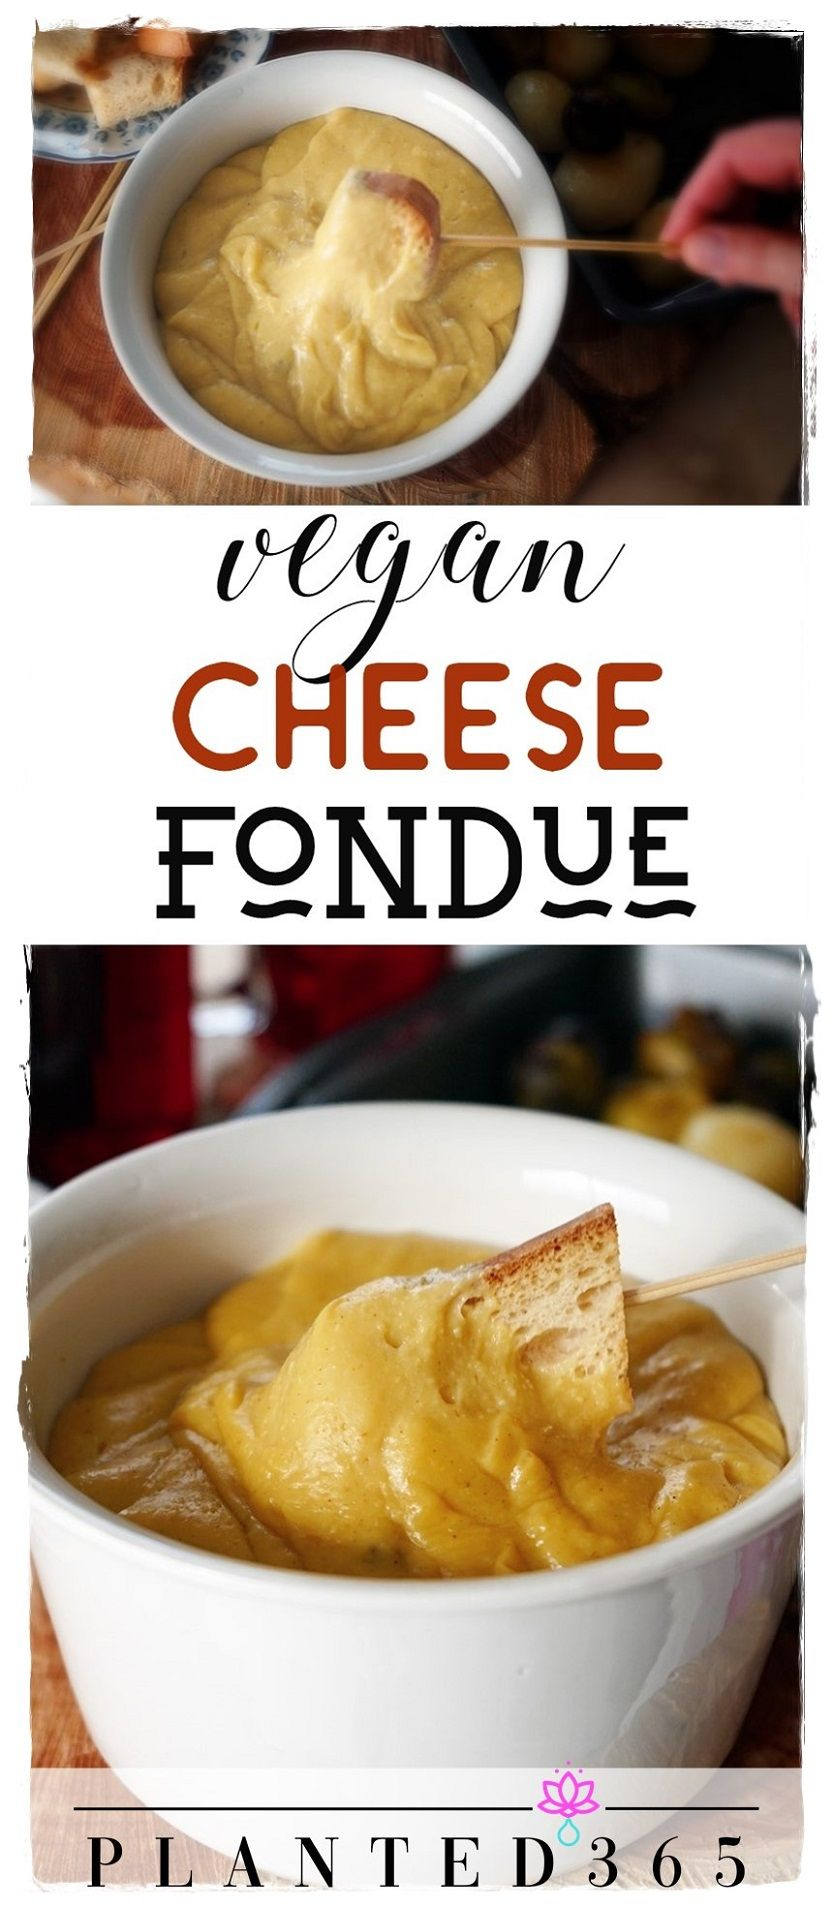 Vegan Cheese Fondue Quick Easy And Healthy Recipe Planted365 Recipe In 2020 Vegan Snacks Easy Vegan Cheese Recipes Vegan Fondue